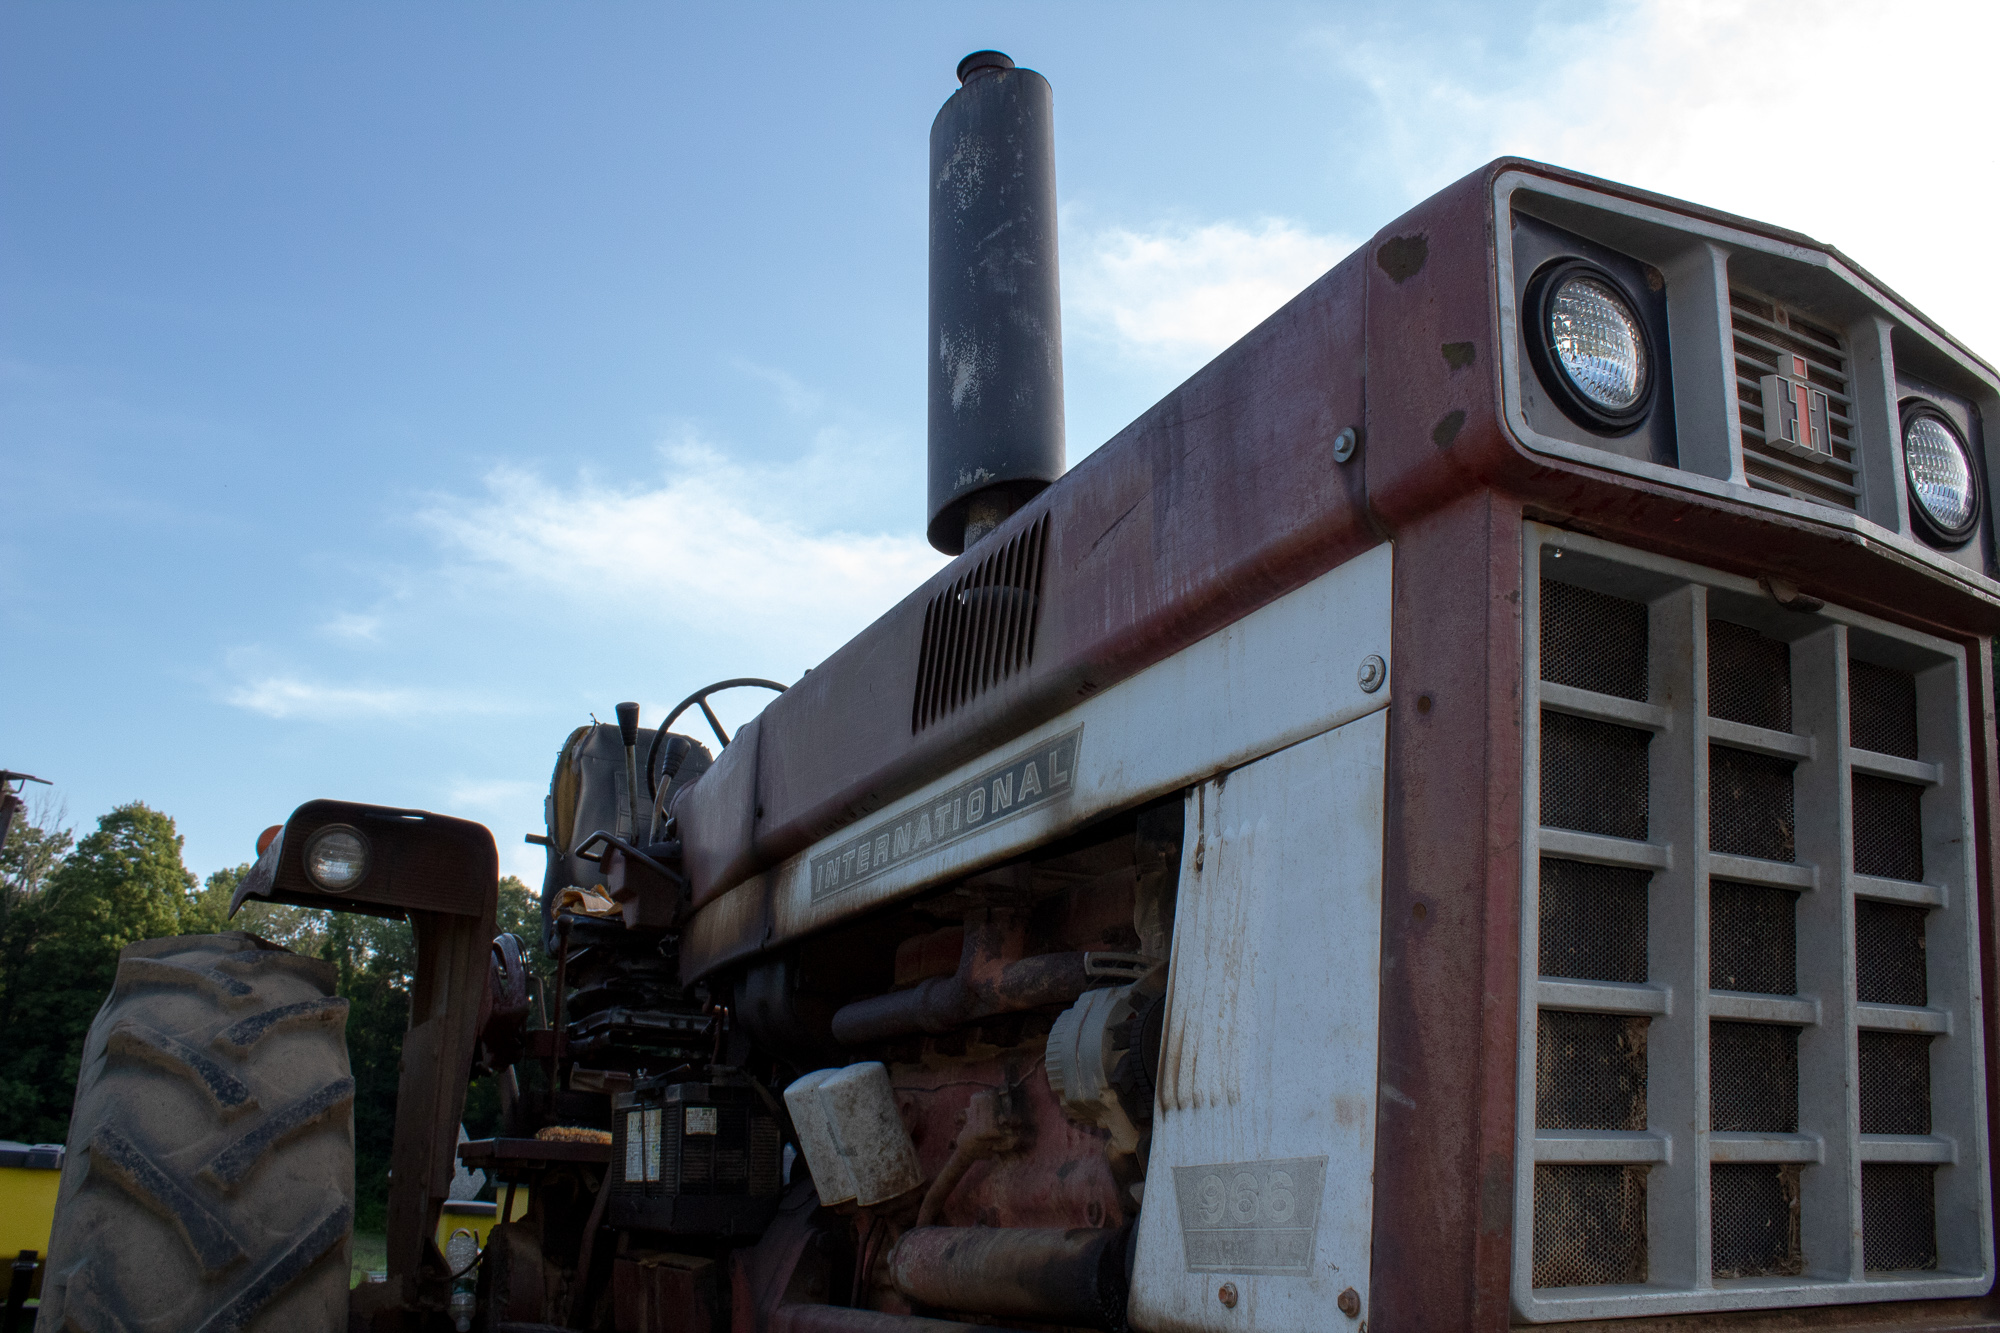 farmall tractor1274.jpg